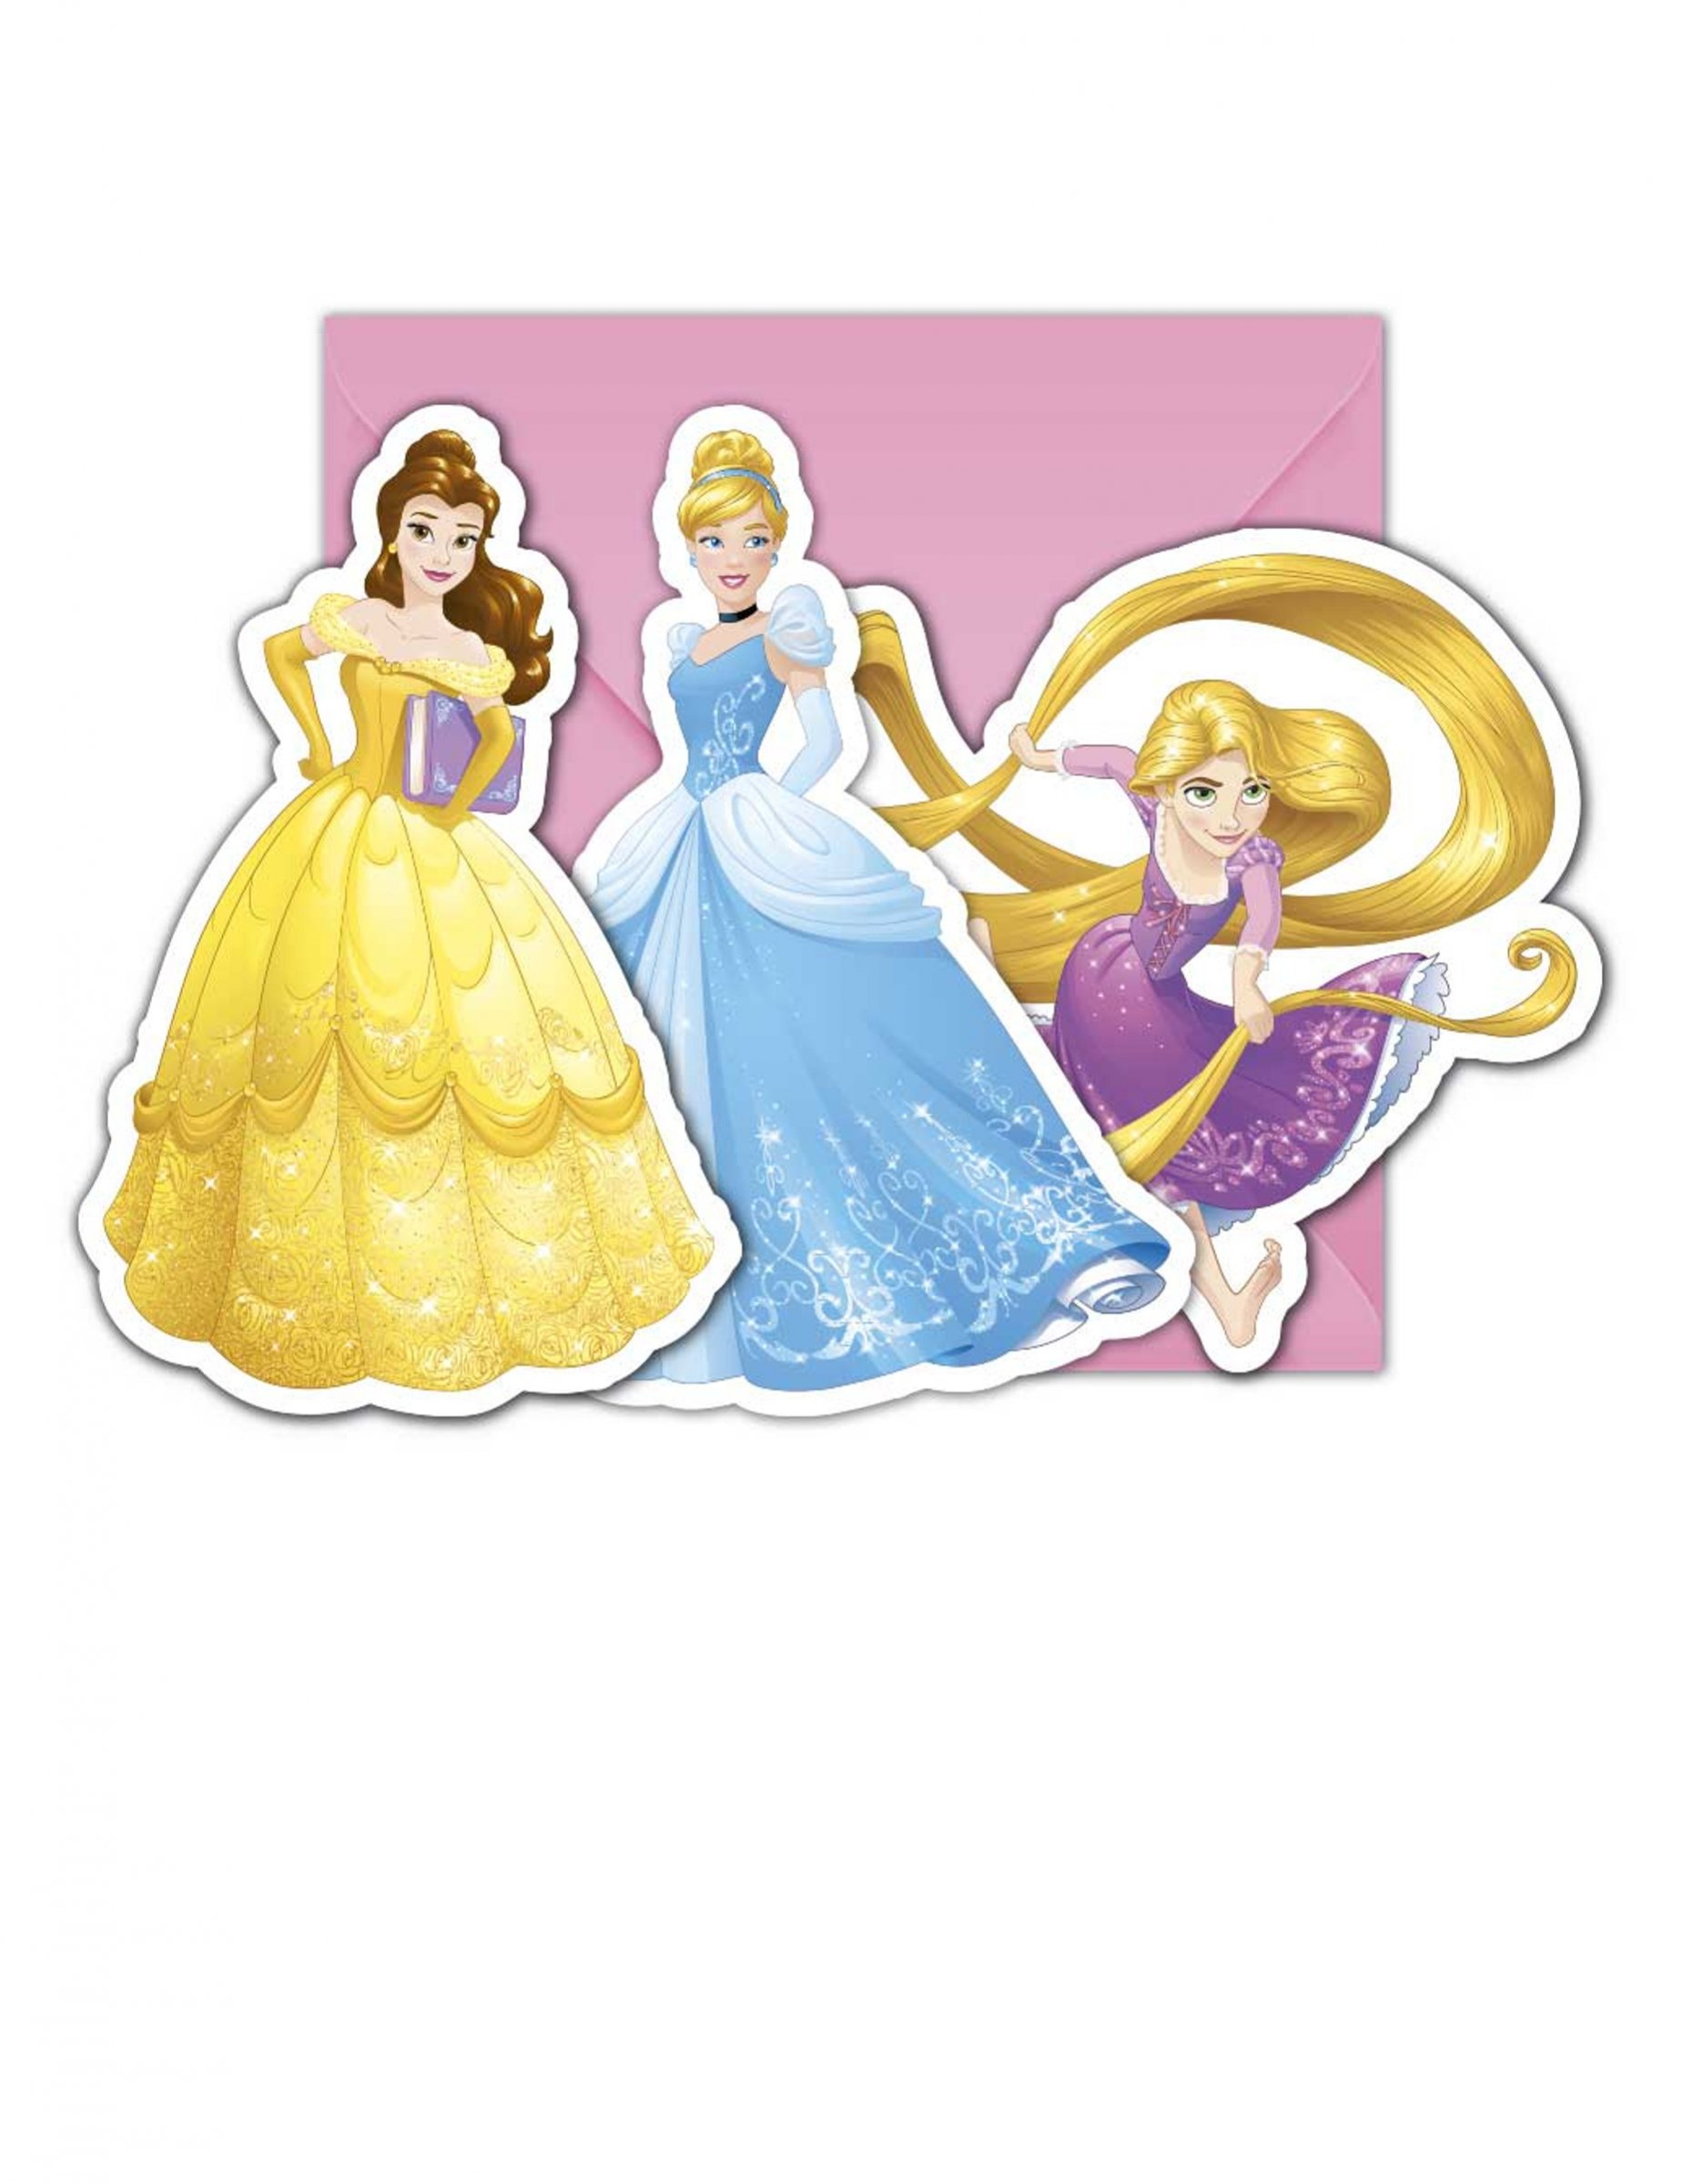 6 cartes dinvitation enveloppes princesses disney dreaming